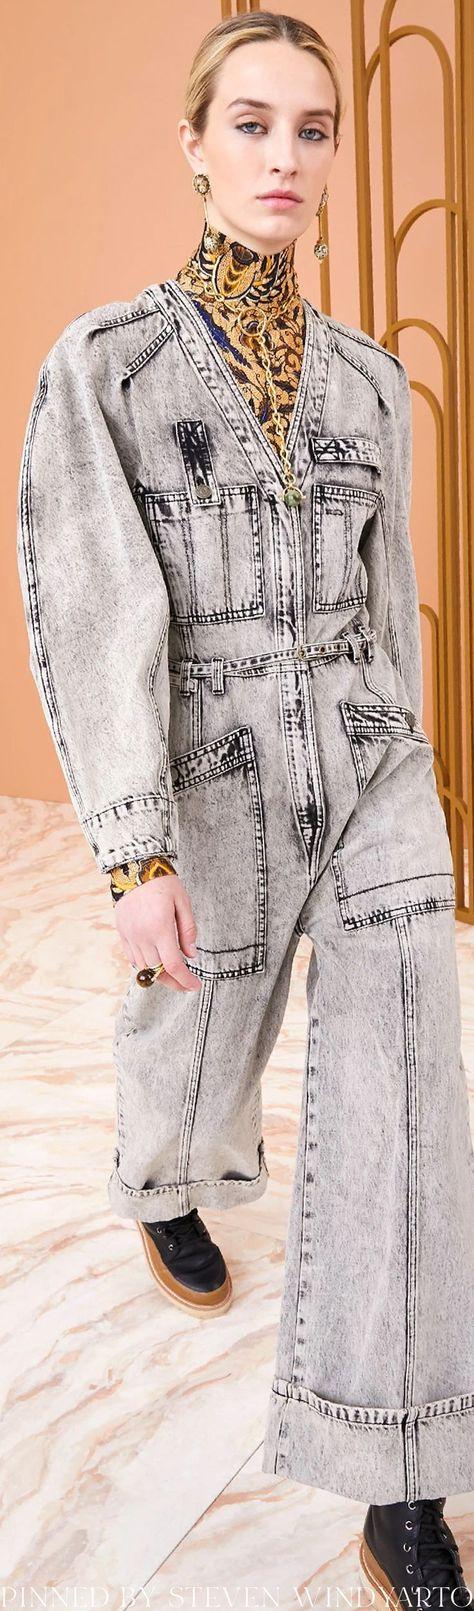 Ulla Johnson Fall 2021 Lookbook - Cameron Jumpsuit #fall2021 #fw21 #womenswear #ullajohnson